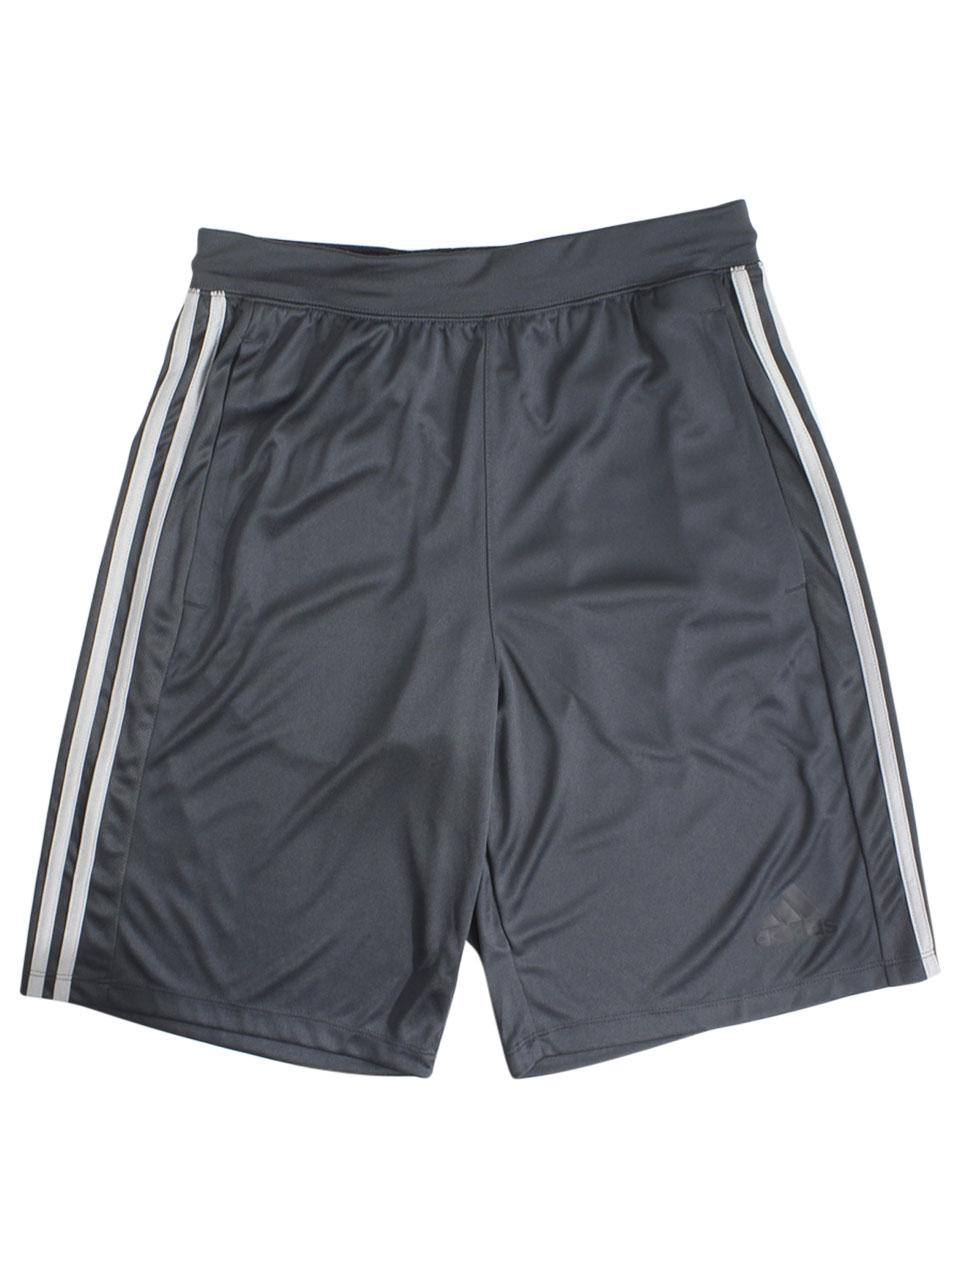 Adidas Men's D2M 3 Stripes Climalite Shorts